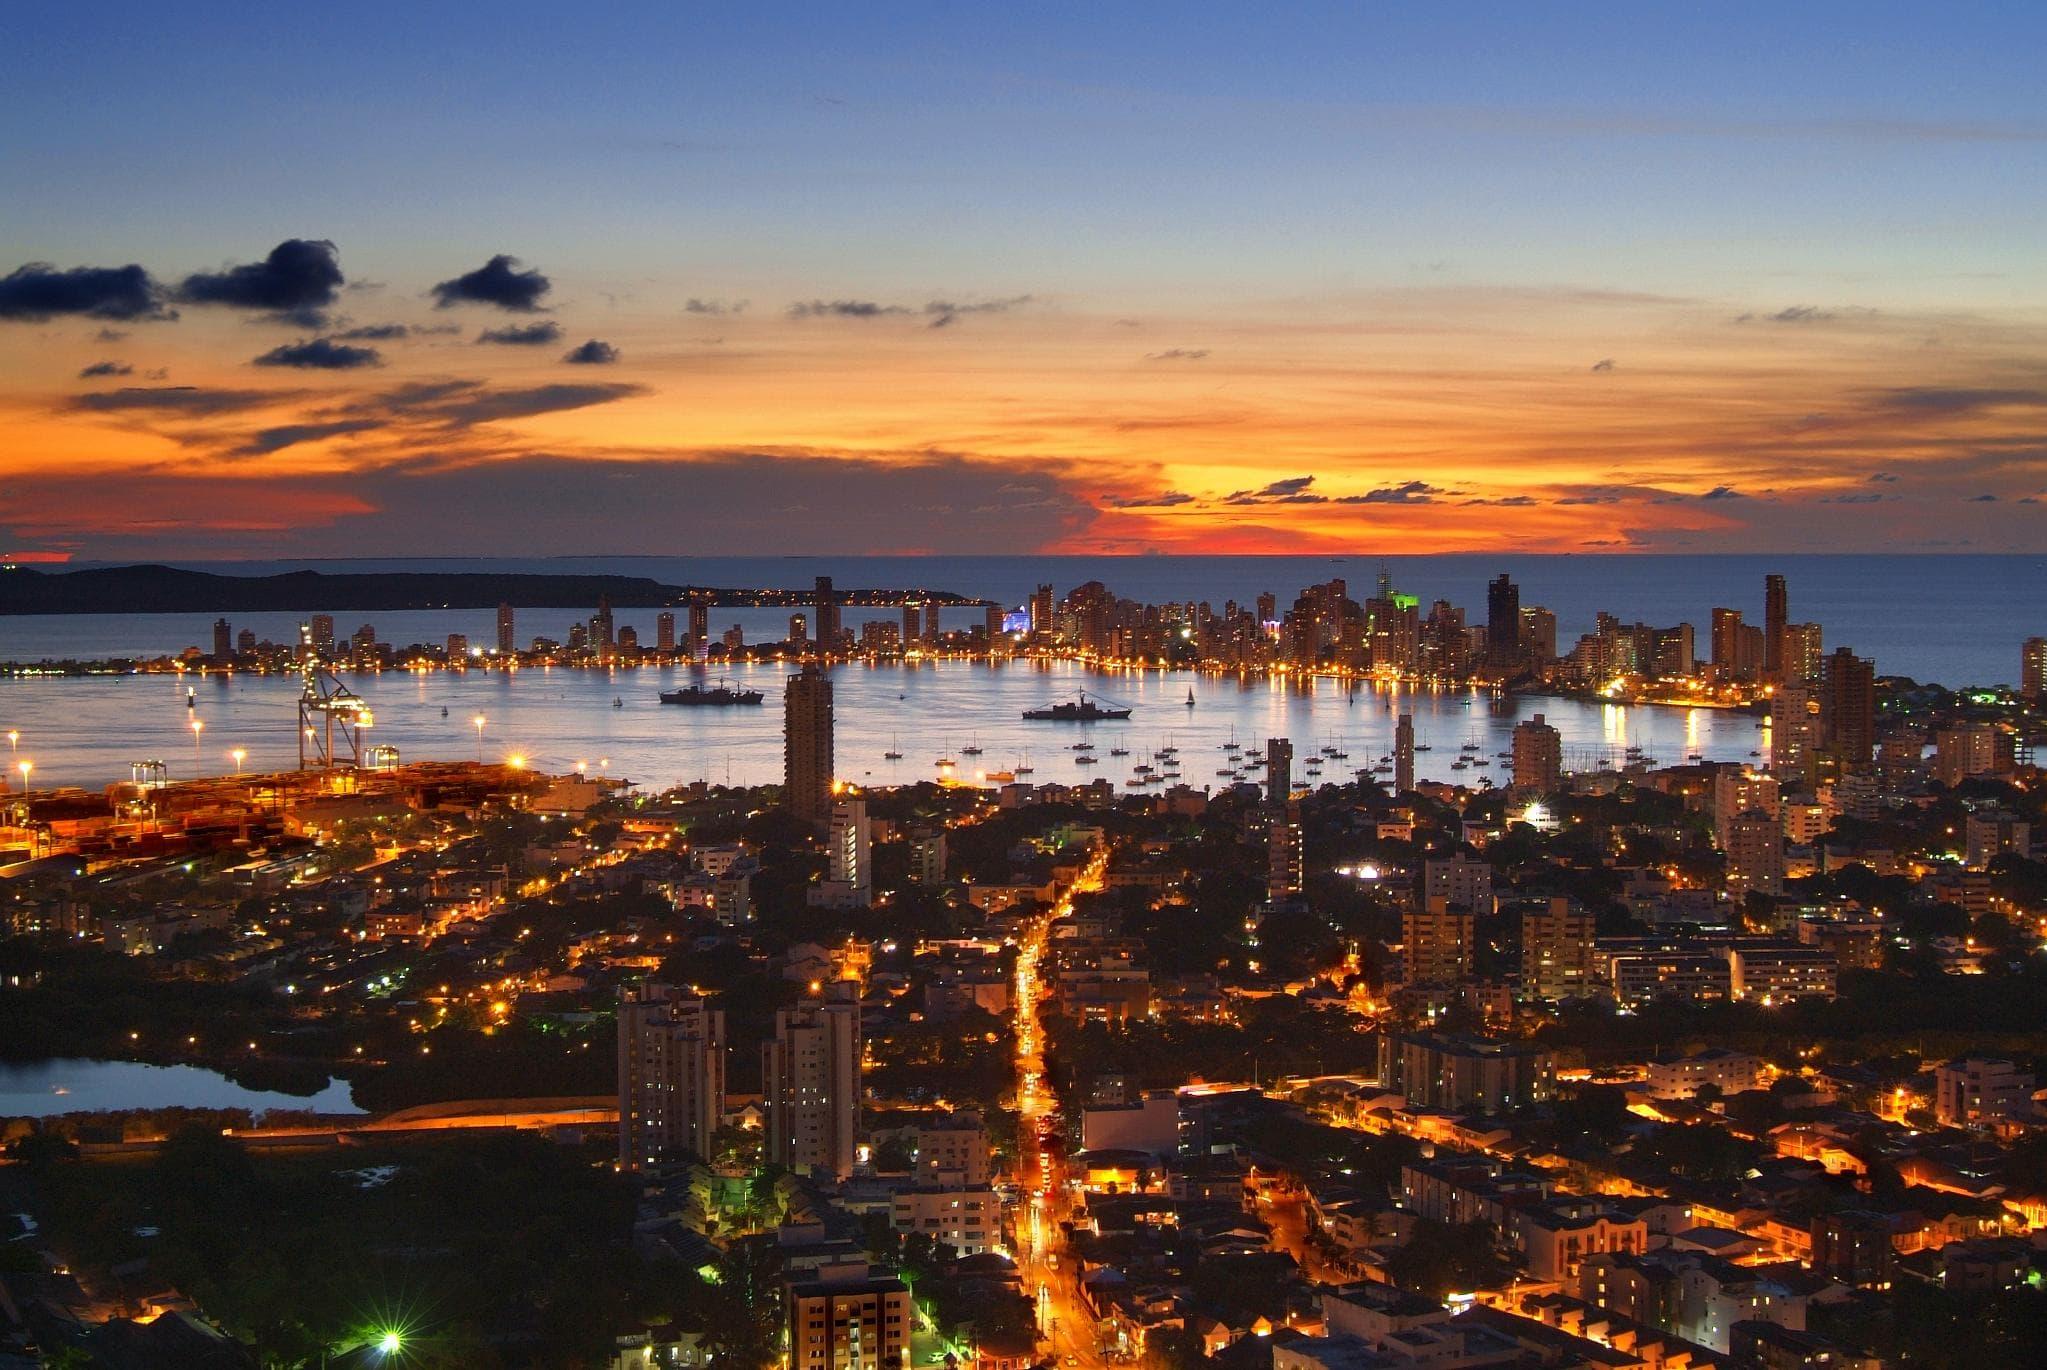 colombia cartagena nightlife cityscape